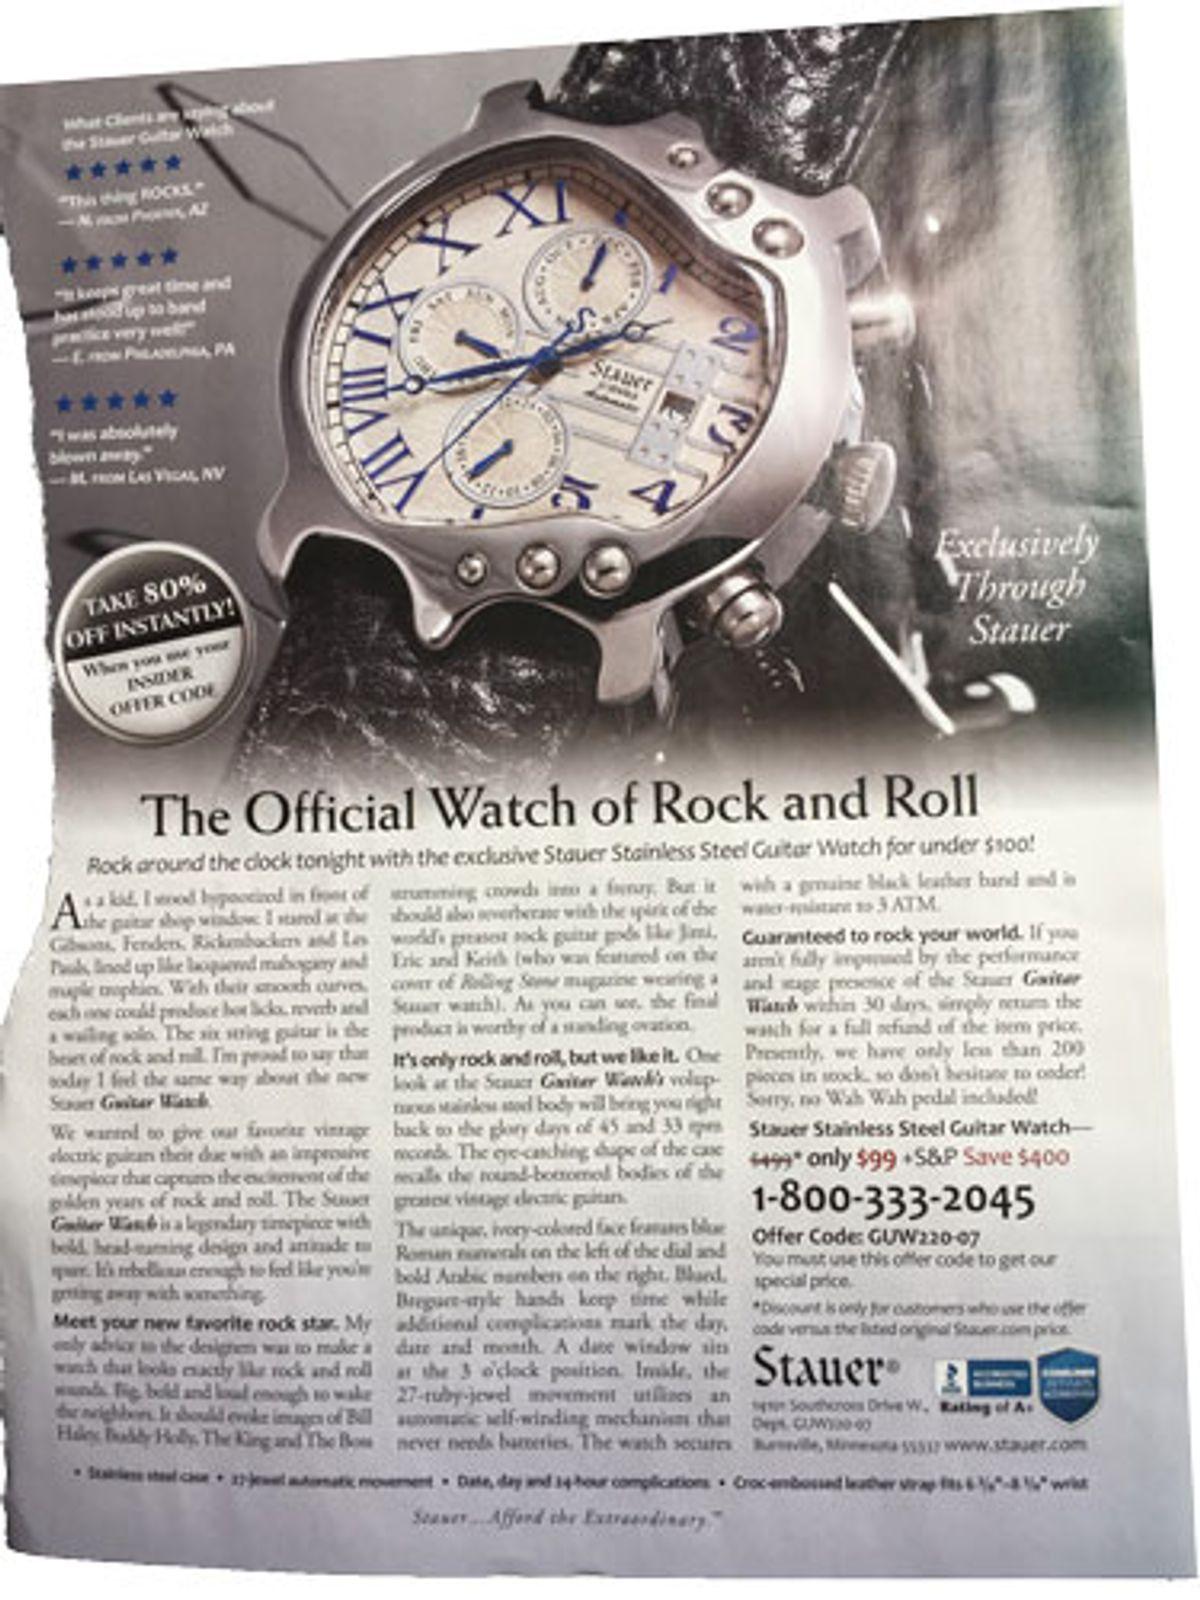 Tuning Up: The Woebegone Wanker Watch™